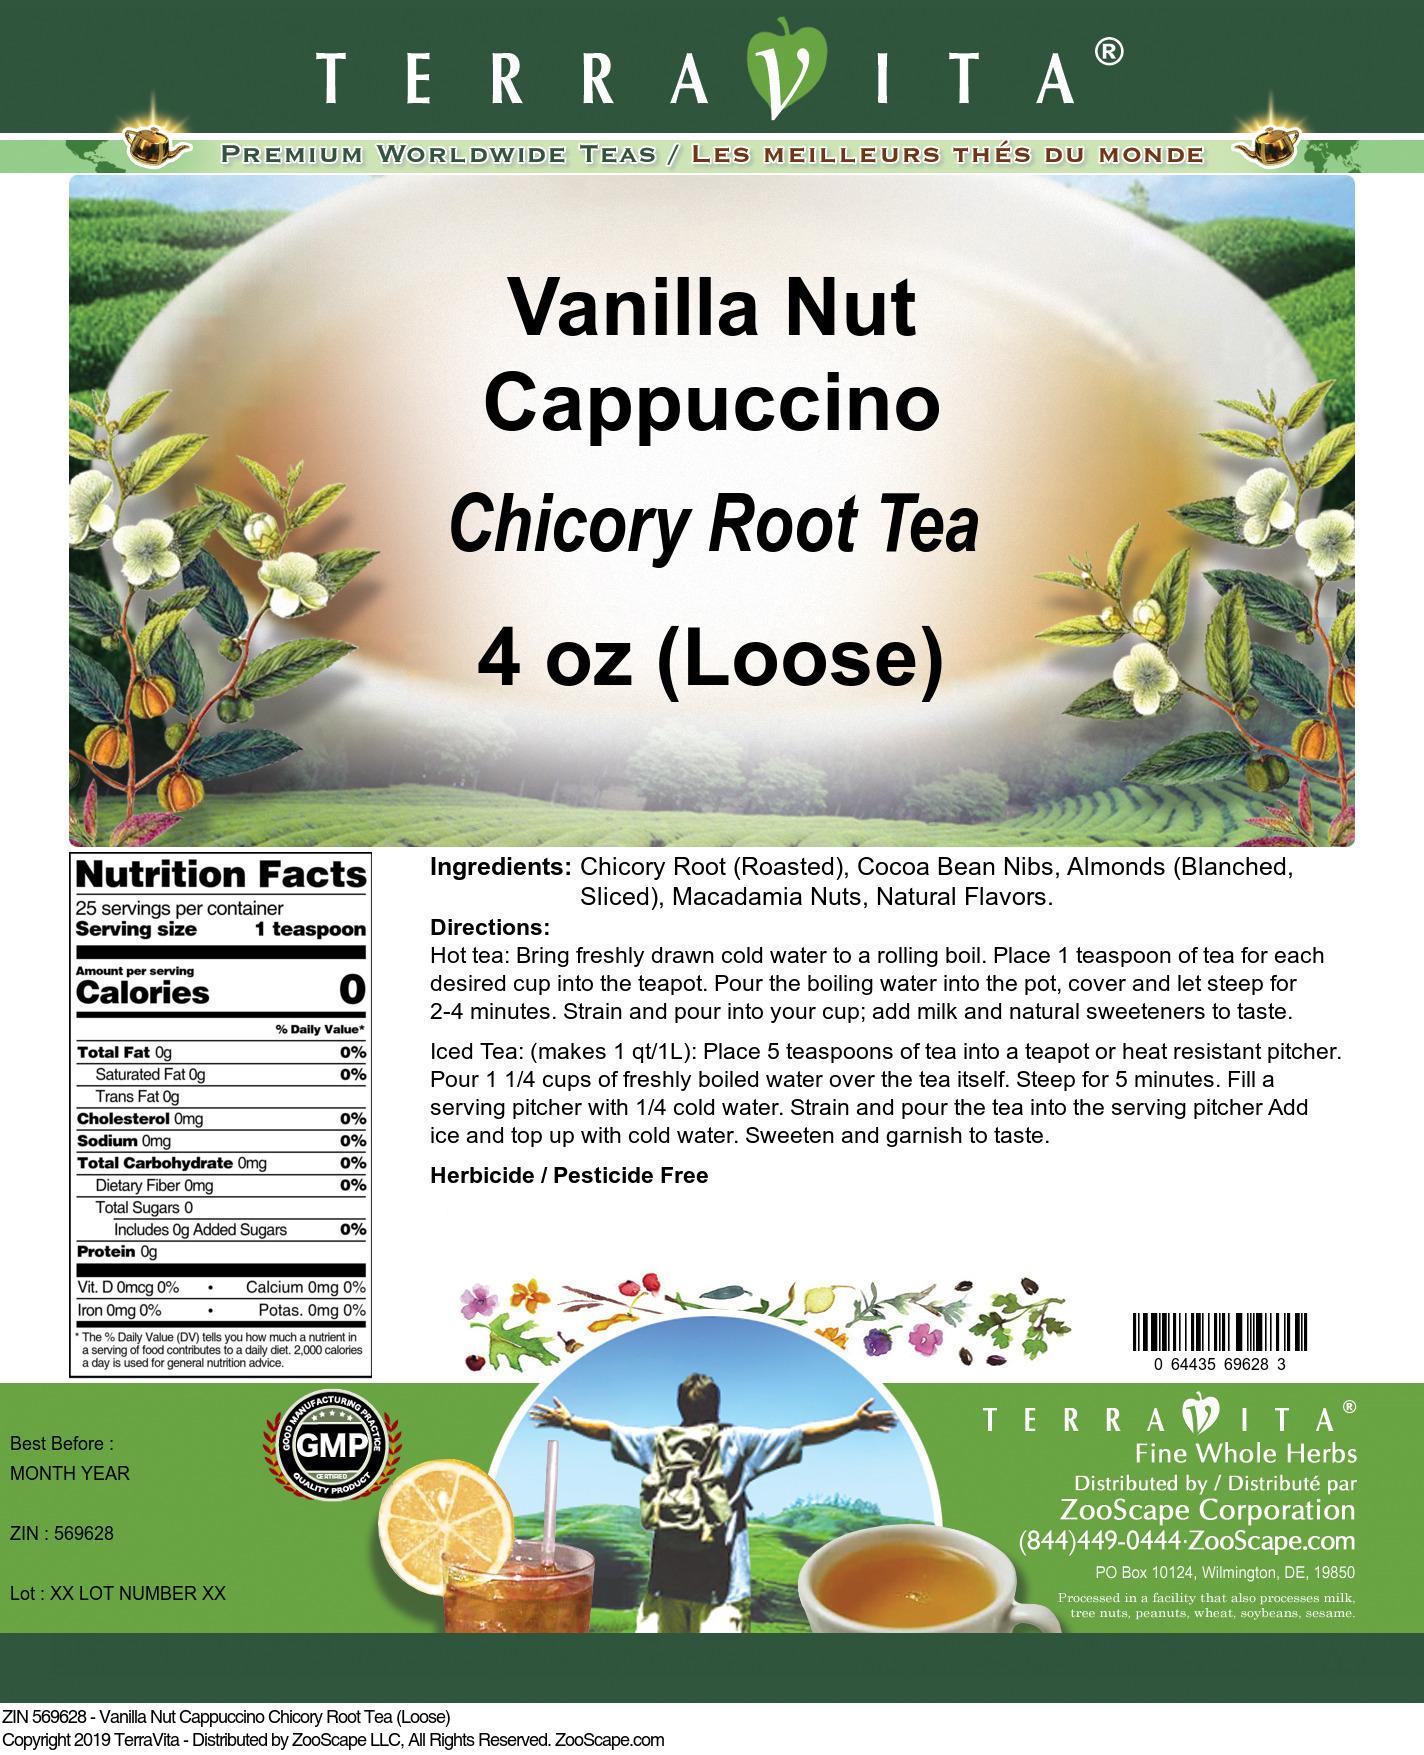 Vanilla Nut Cappuccino Chicory Root Tea (Loose)